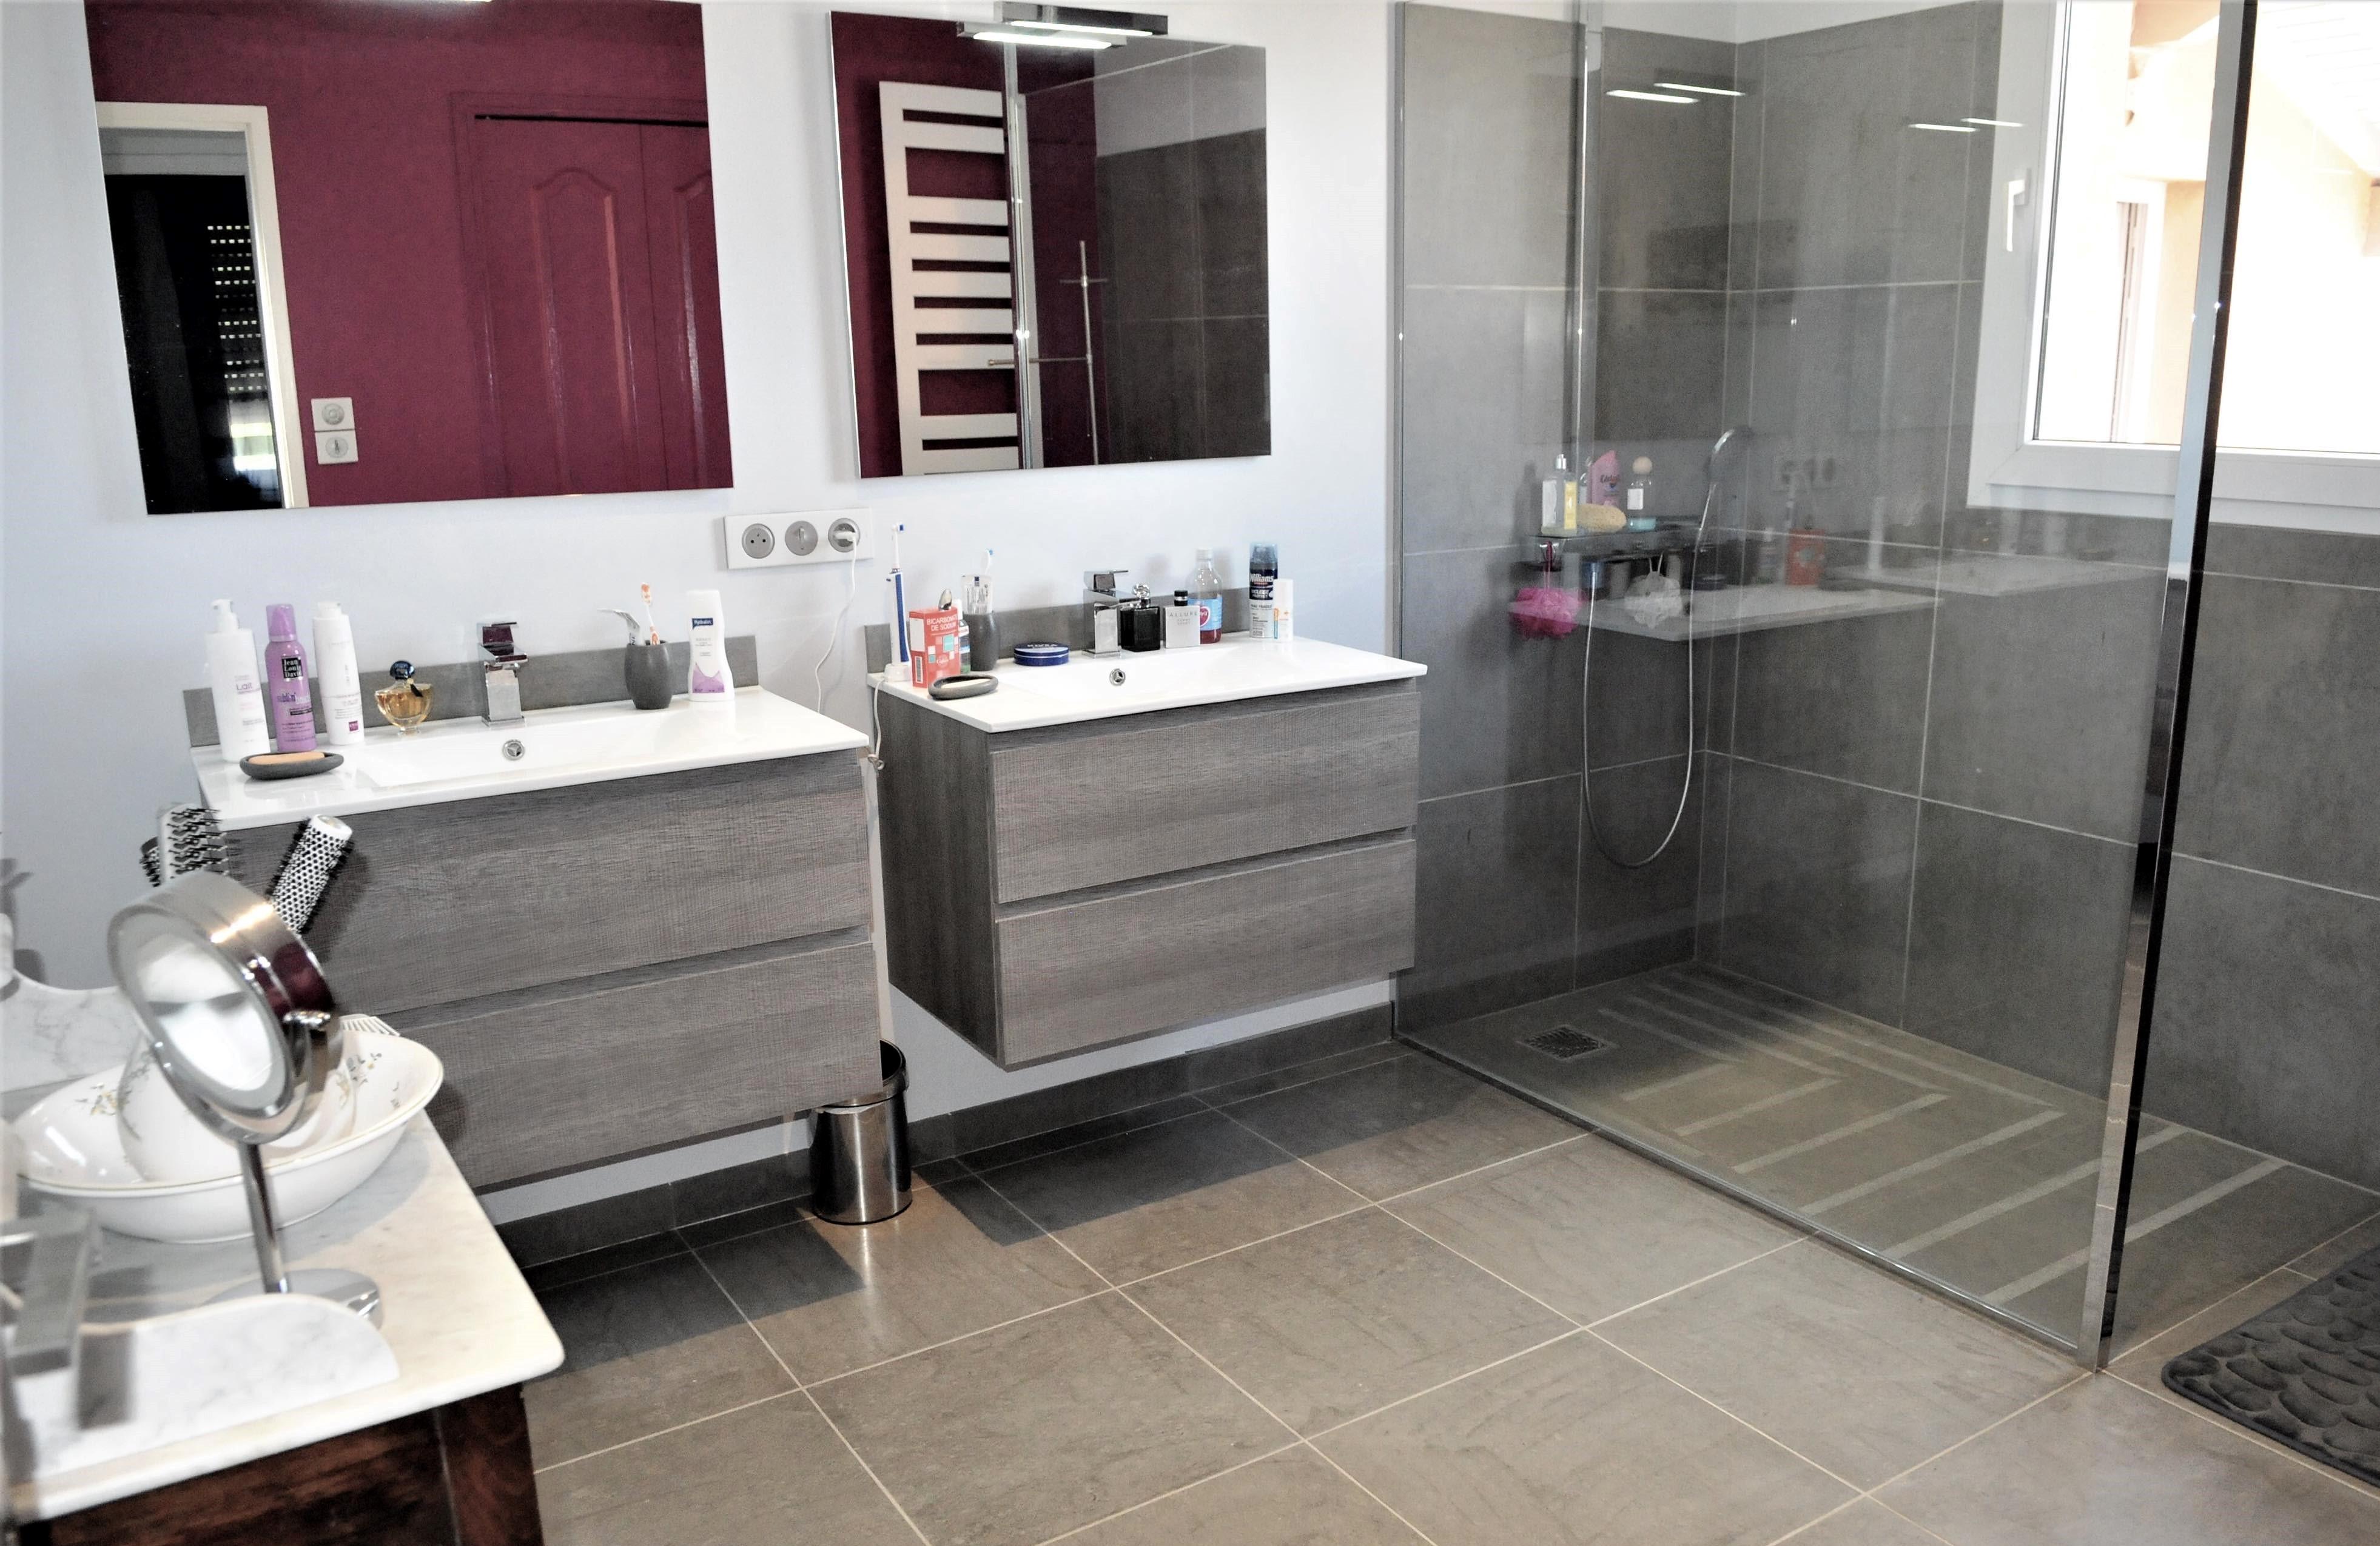 salle de bain pierre bleu. Black Bedroom Furniture Sets. Home Design Ideas